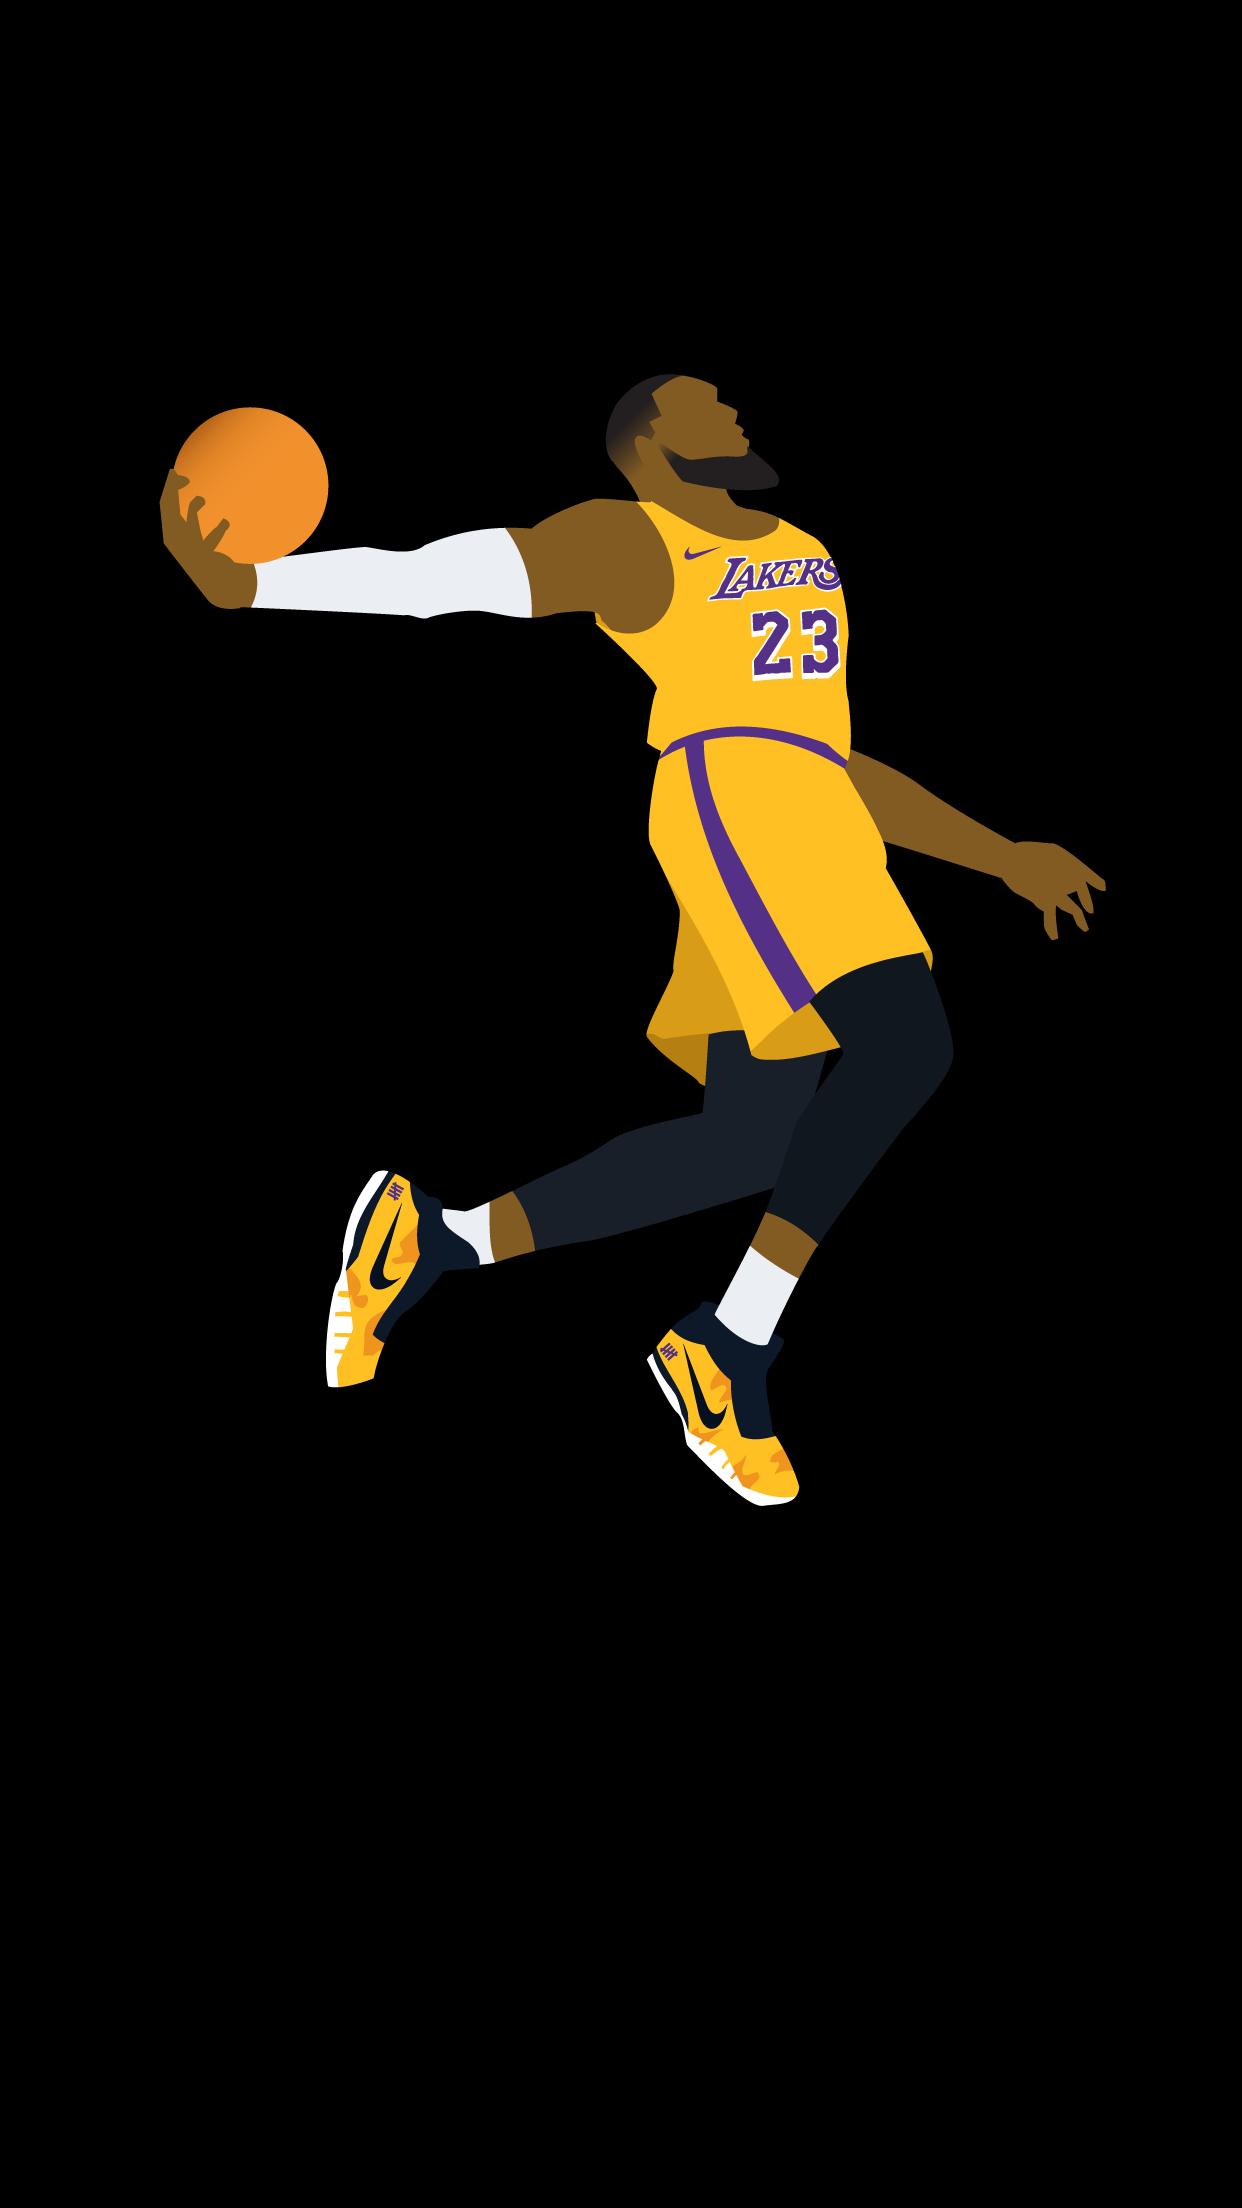 Lebron Wallpaper Hd Lakers 1986544 Hd Wallpaper Backgrounds Download